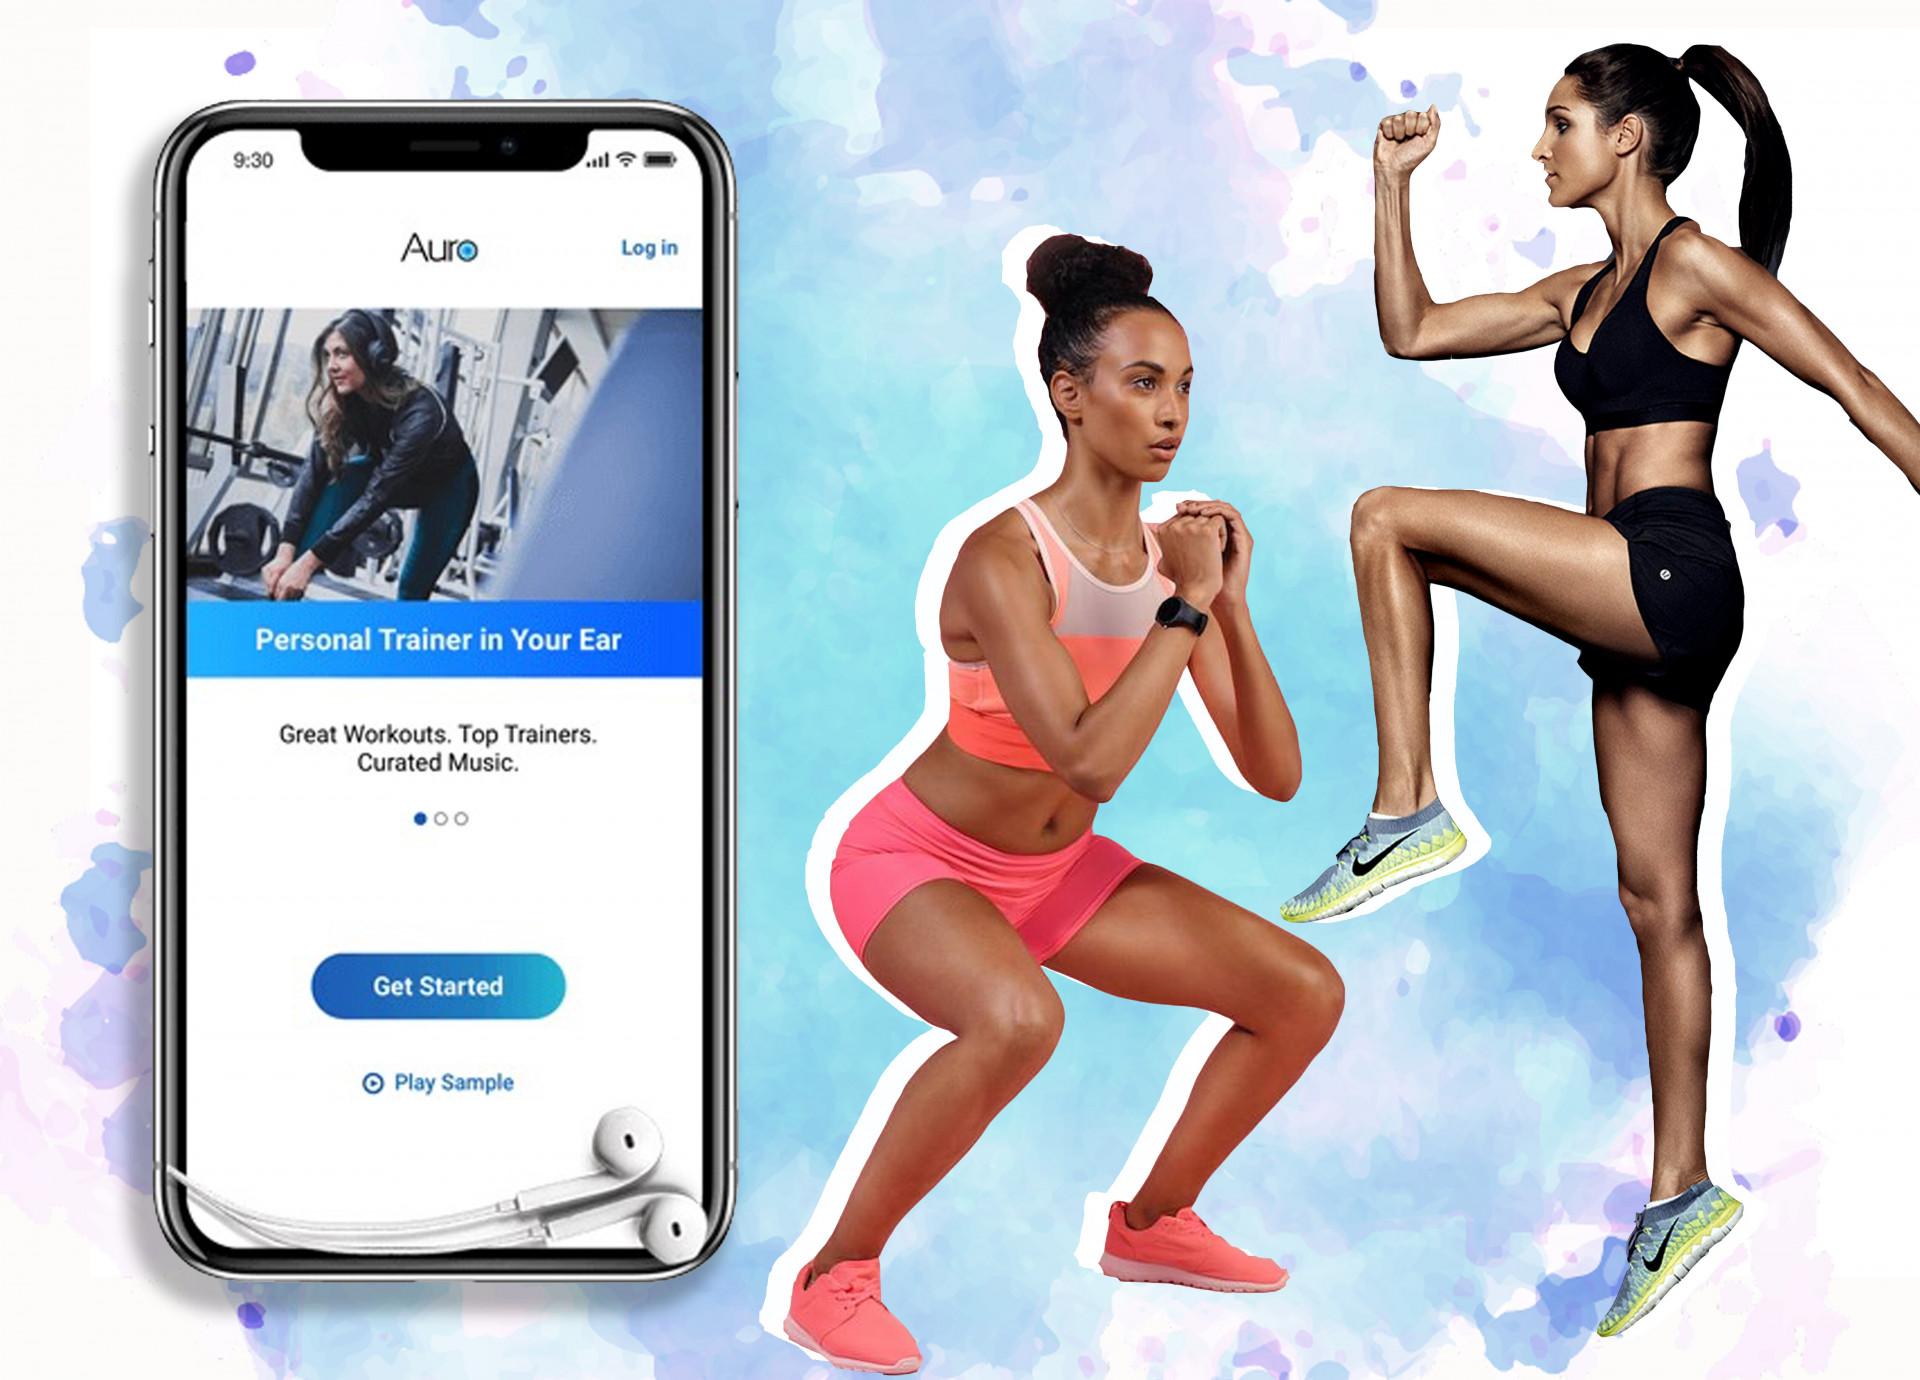 'Auro' Fitness App